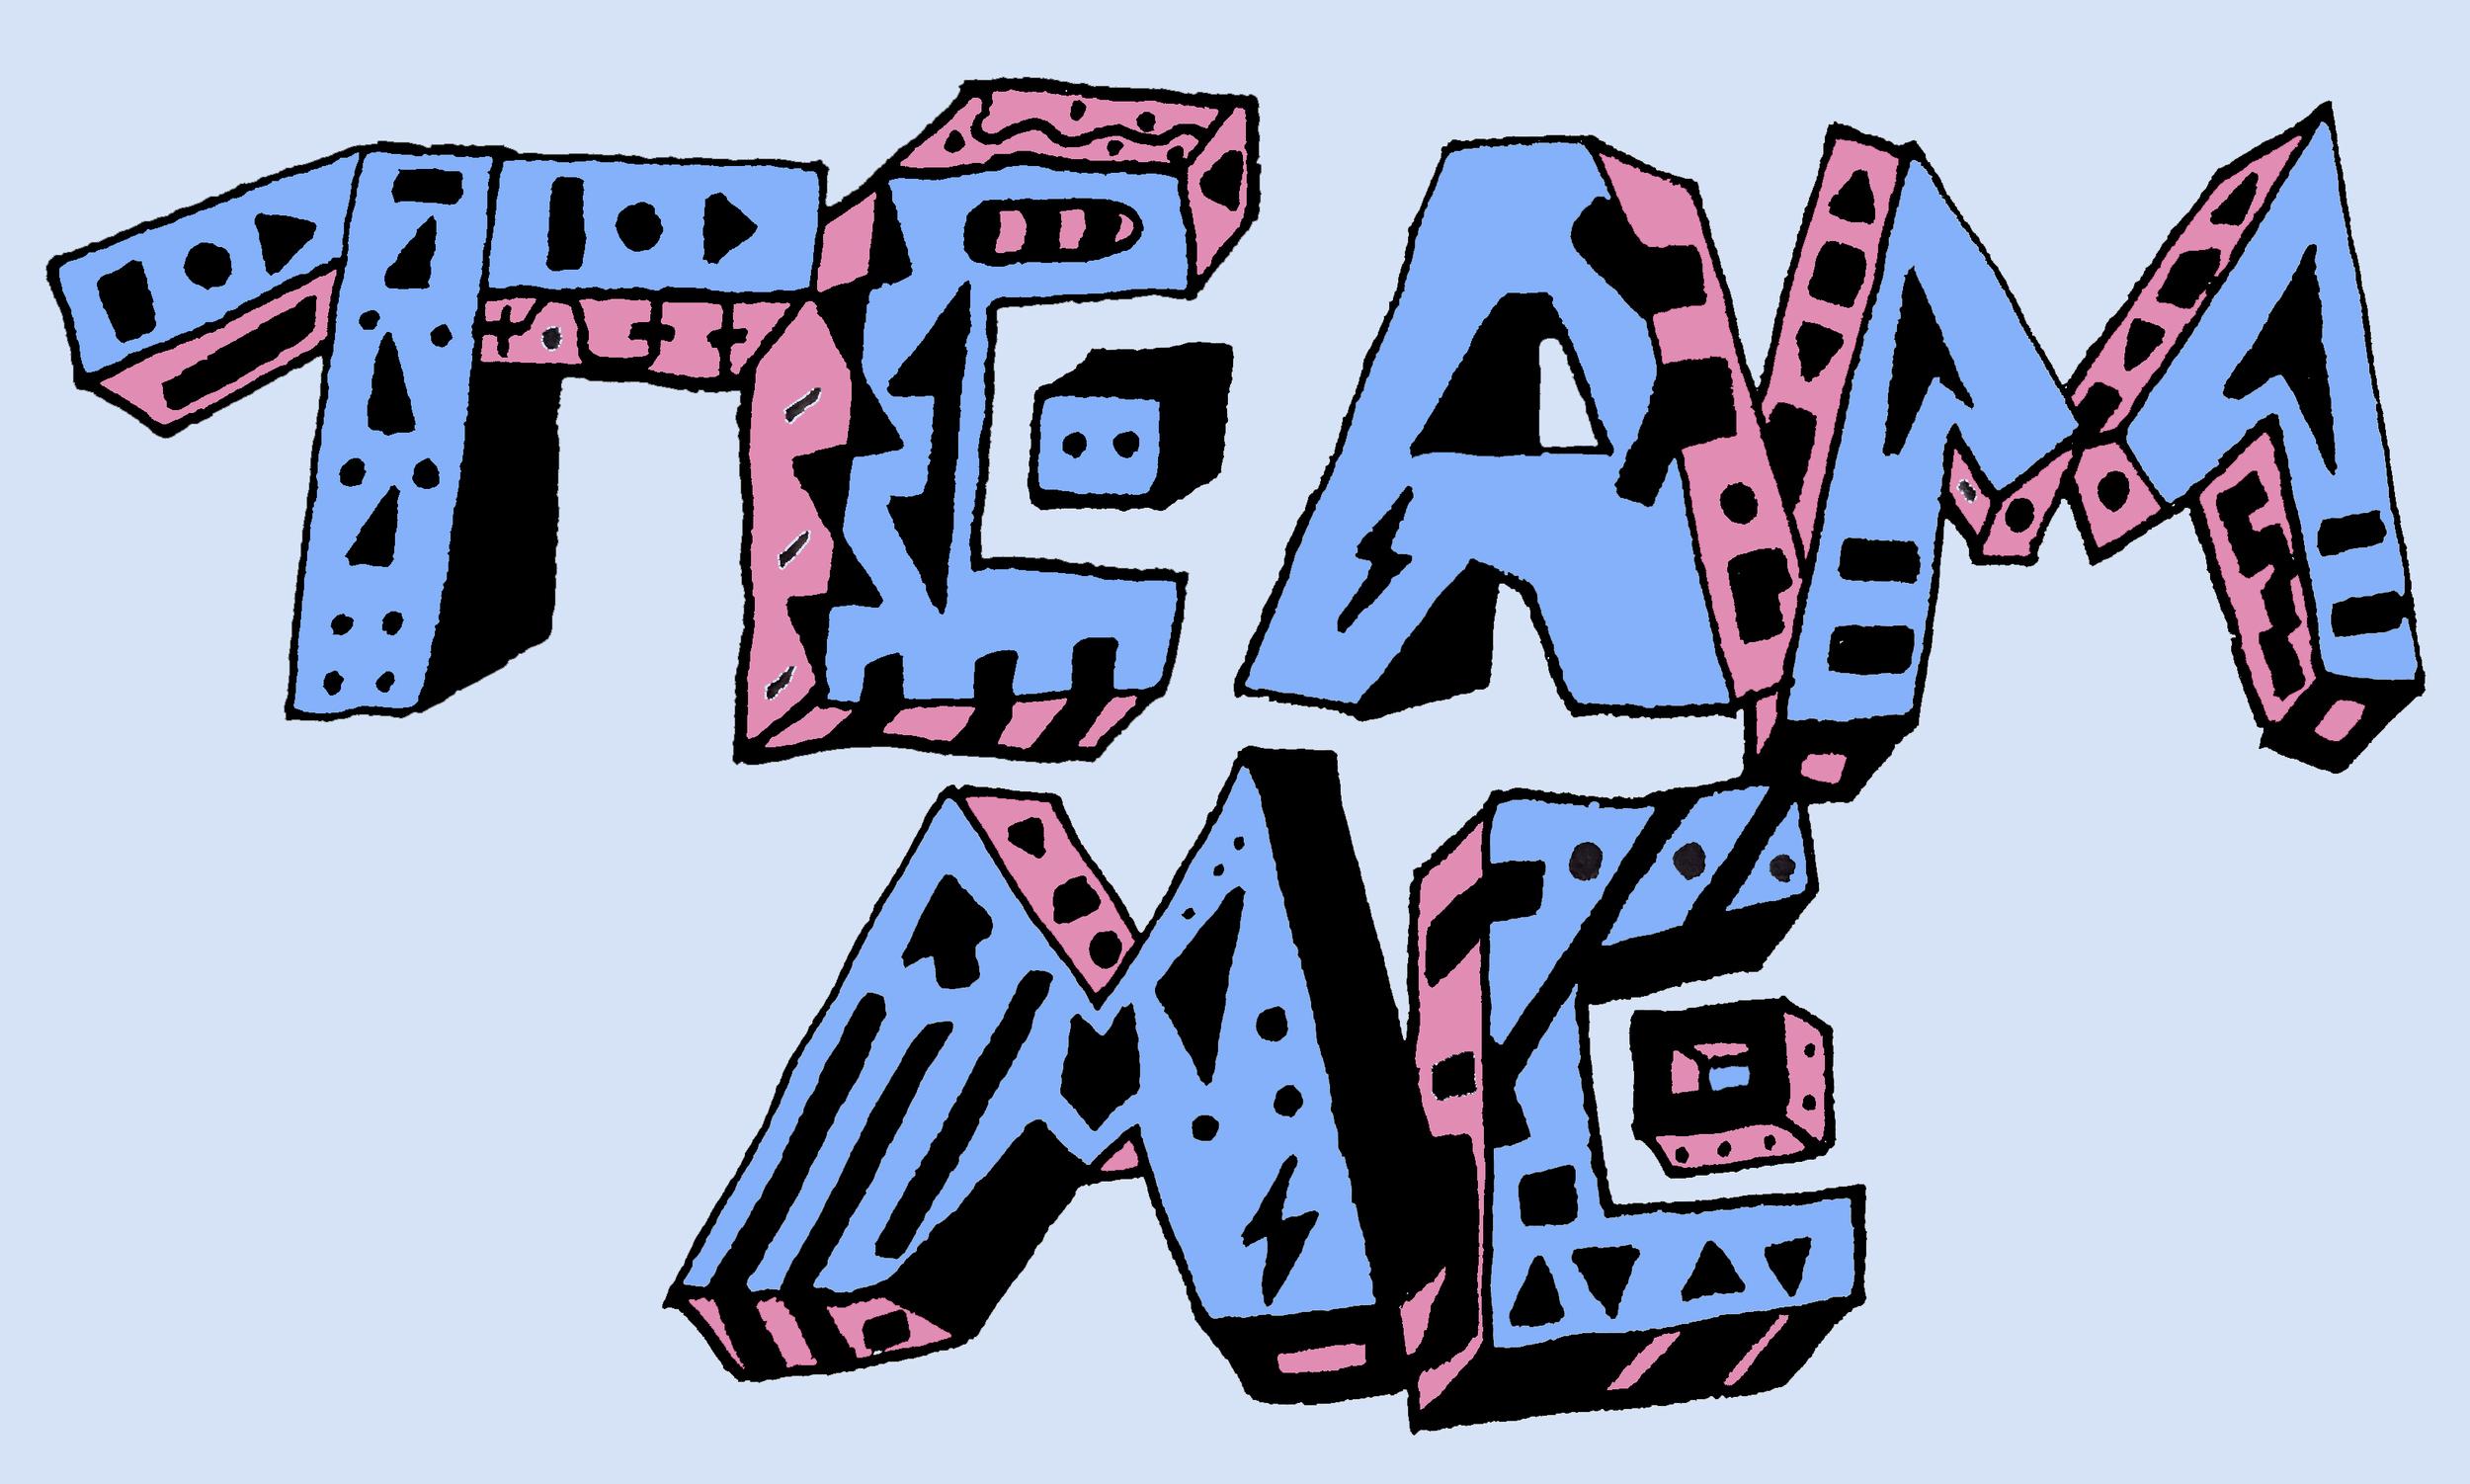 Team Me T-shirt, 2016